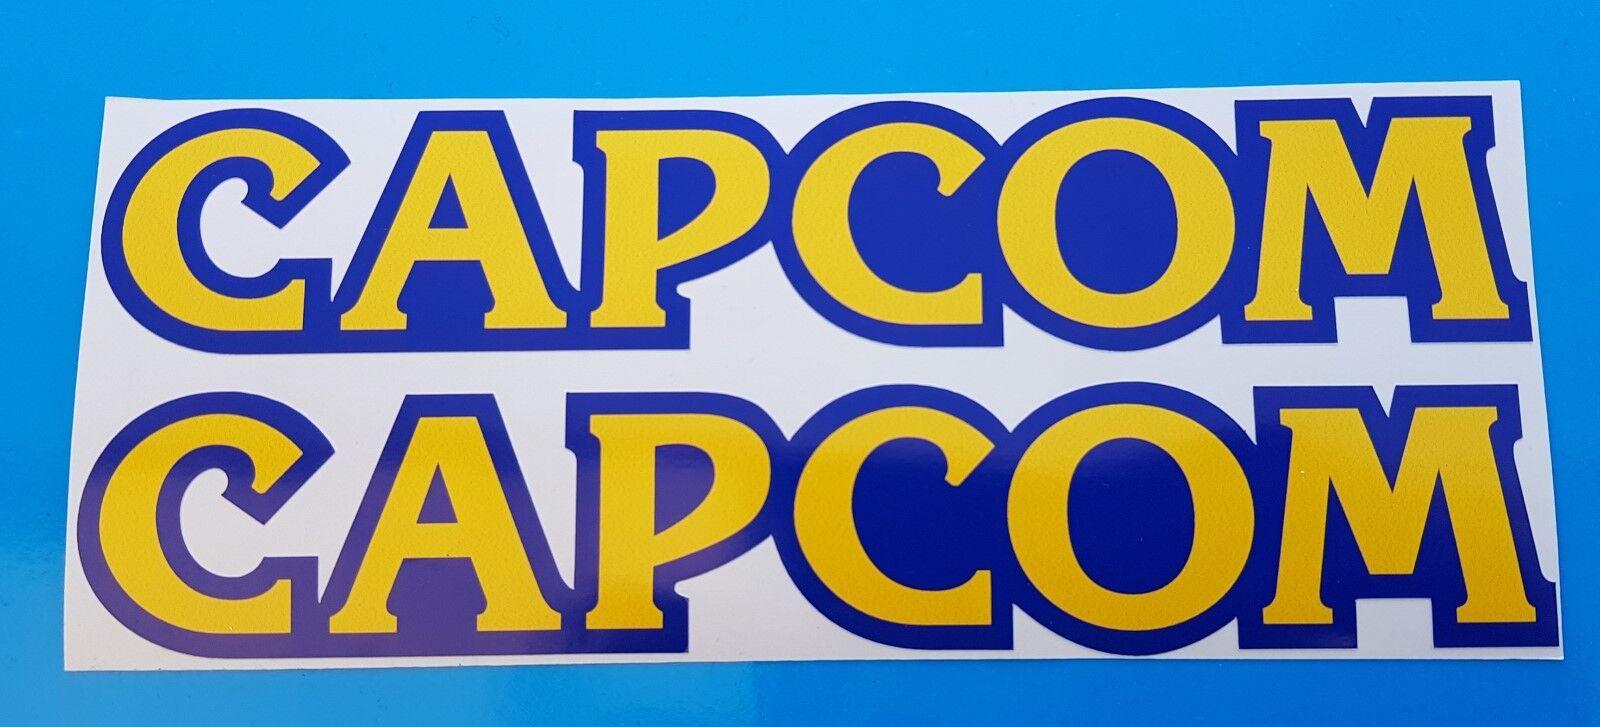 Capcom Stickers Decal Graphic Vinyl x 2 stickers 8